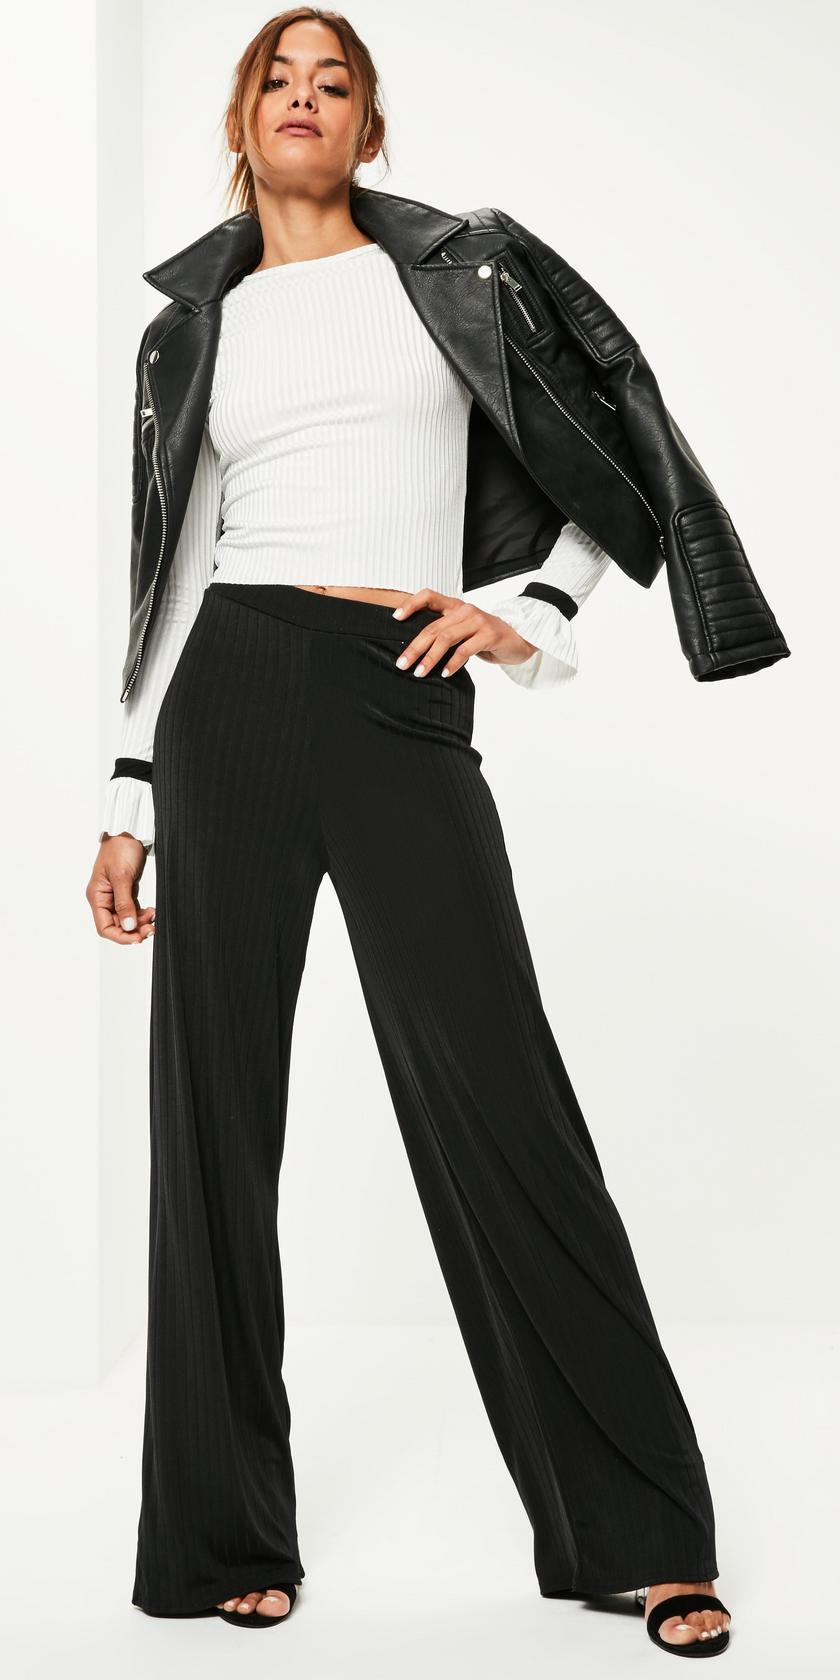 black-wideleg-pants-white-top-black-jacket-moto-black-shoe-sandalh-fall-winter-brun-dinner.jpg